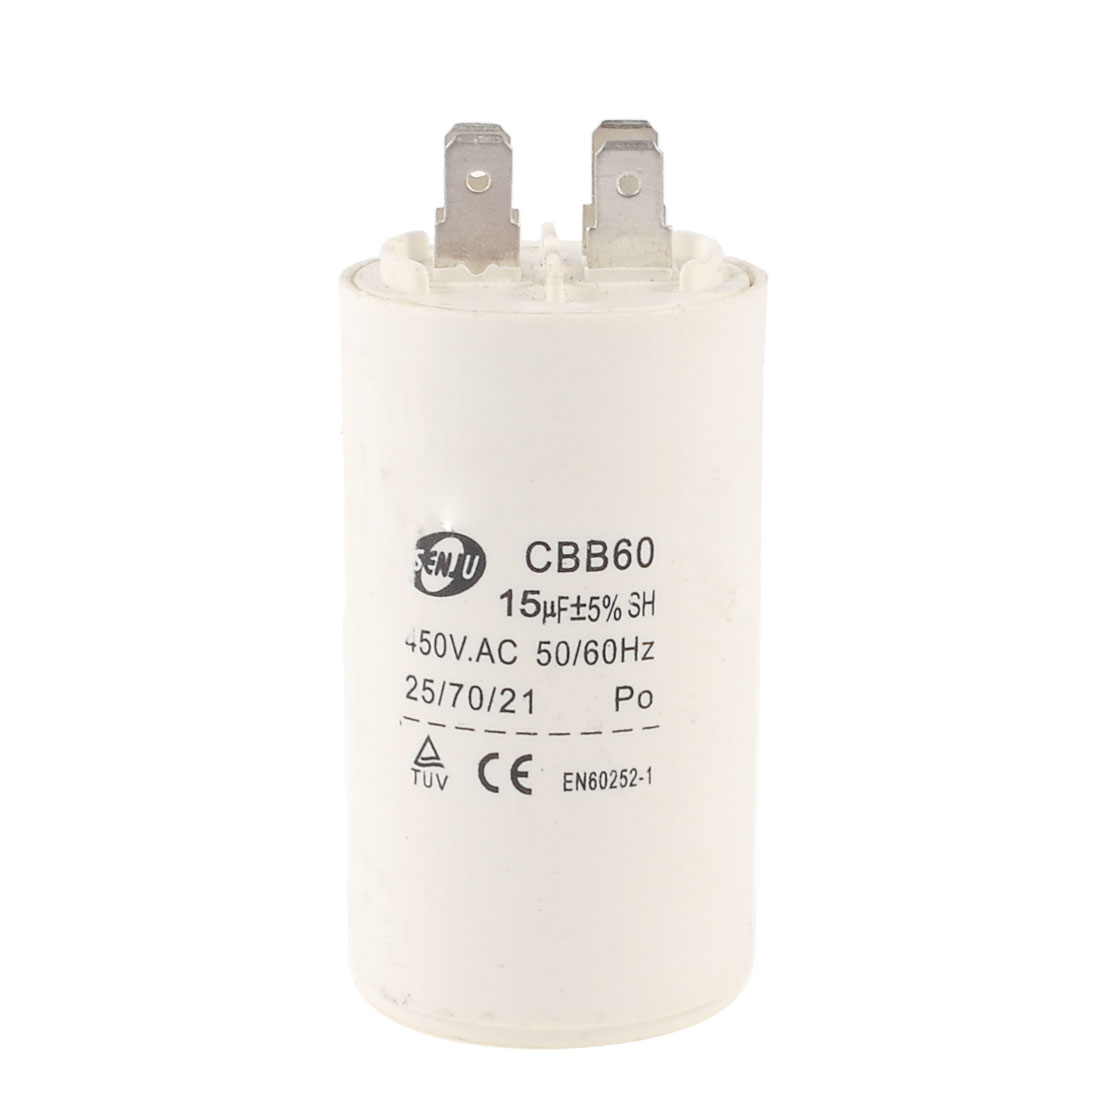 CBB60 15uF 450VAC Polypropylene Film Air Conditioning Motor Run Capacitor